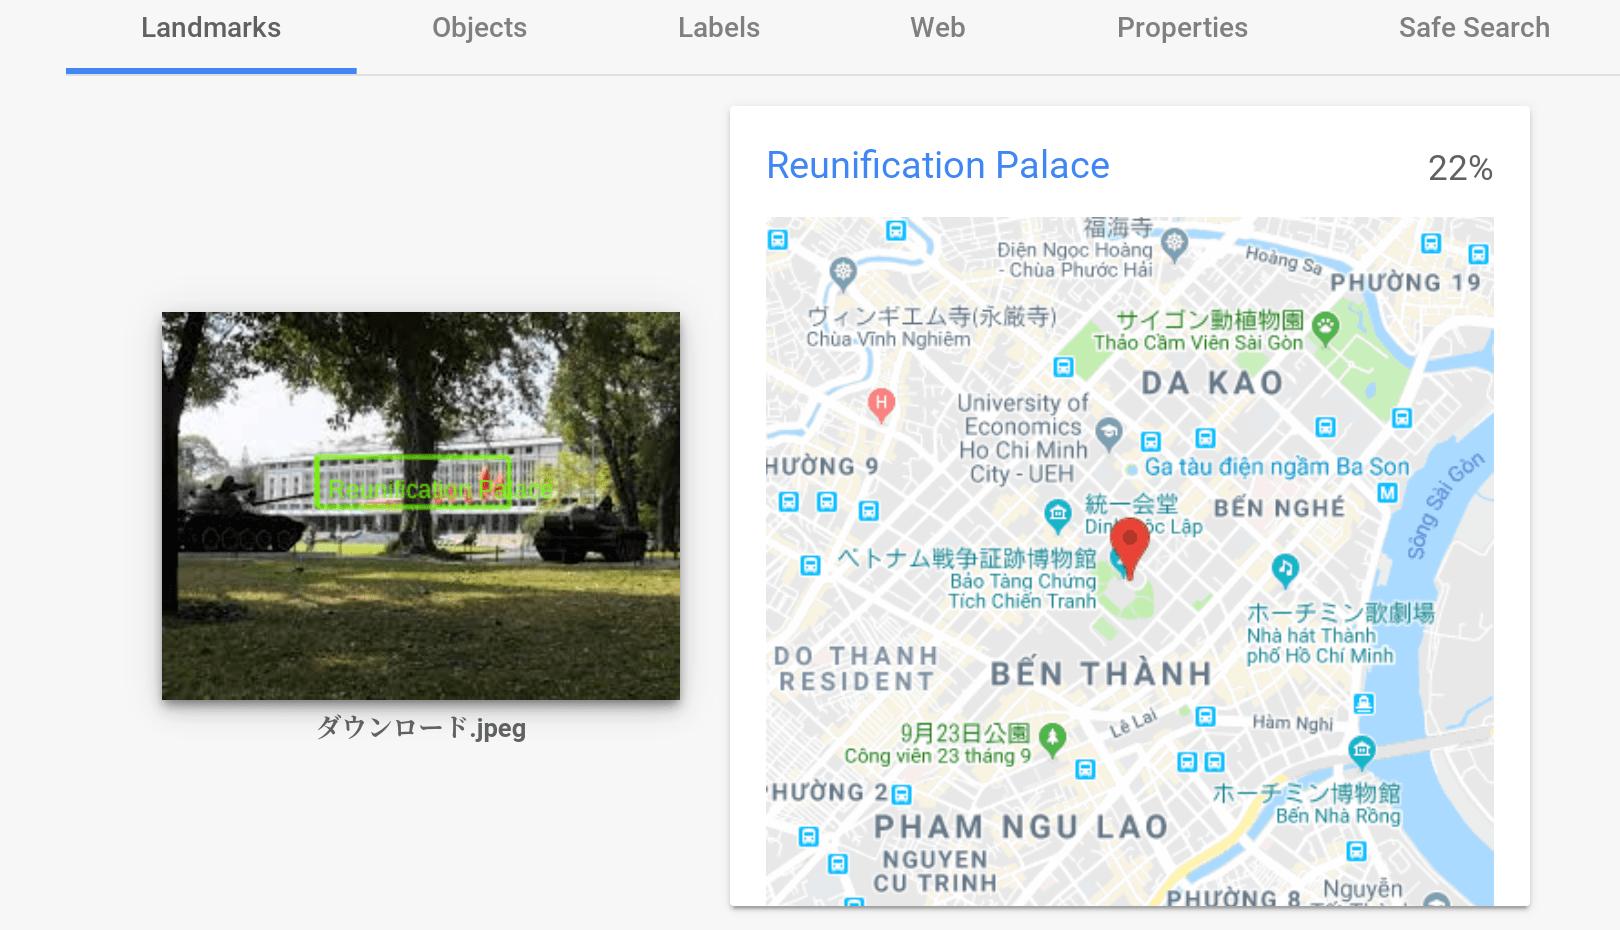 Google Cloud Vision APIの出力結果:ベトナム 統一会堂